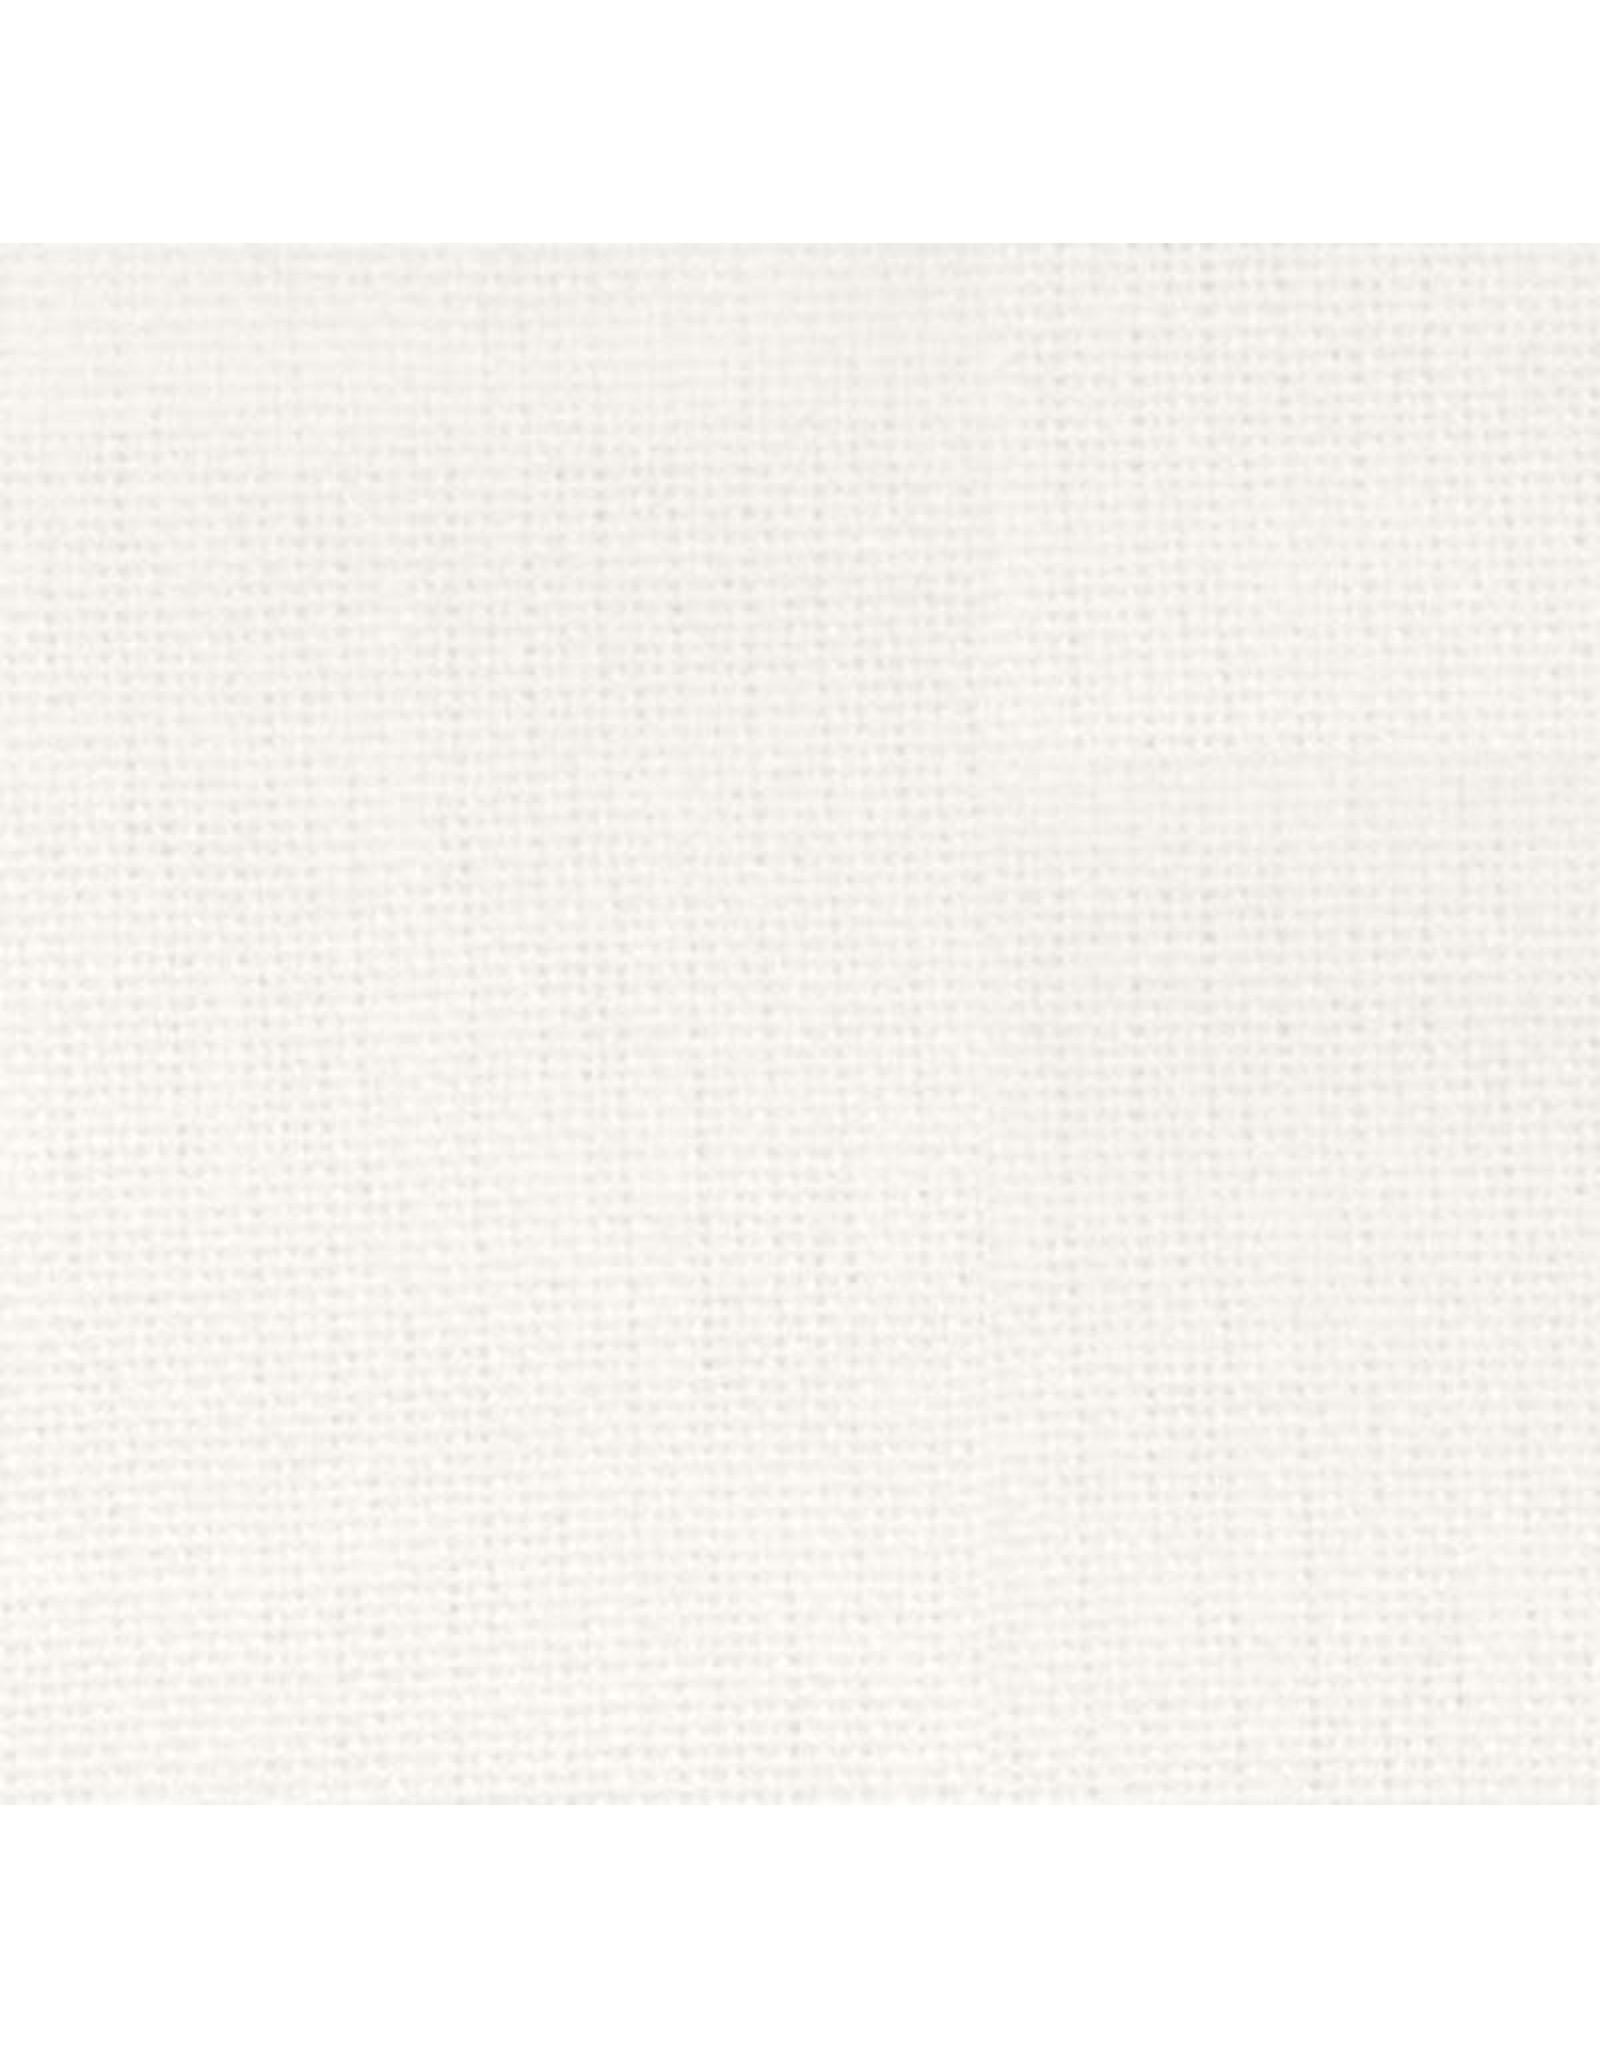 Moda Home Tea or Kitchen Towel, White, Plain Hem, Perfect for Embroidery